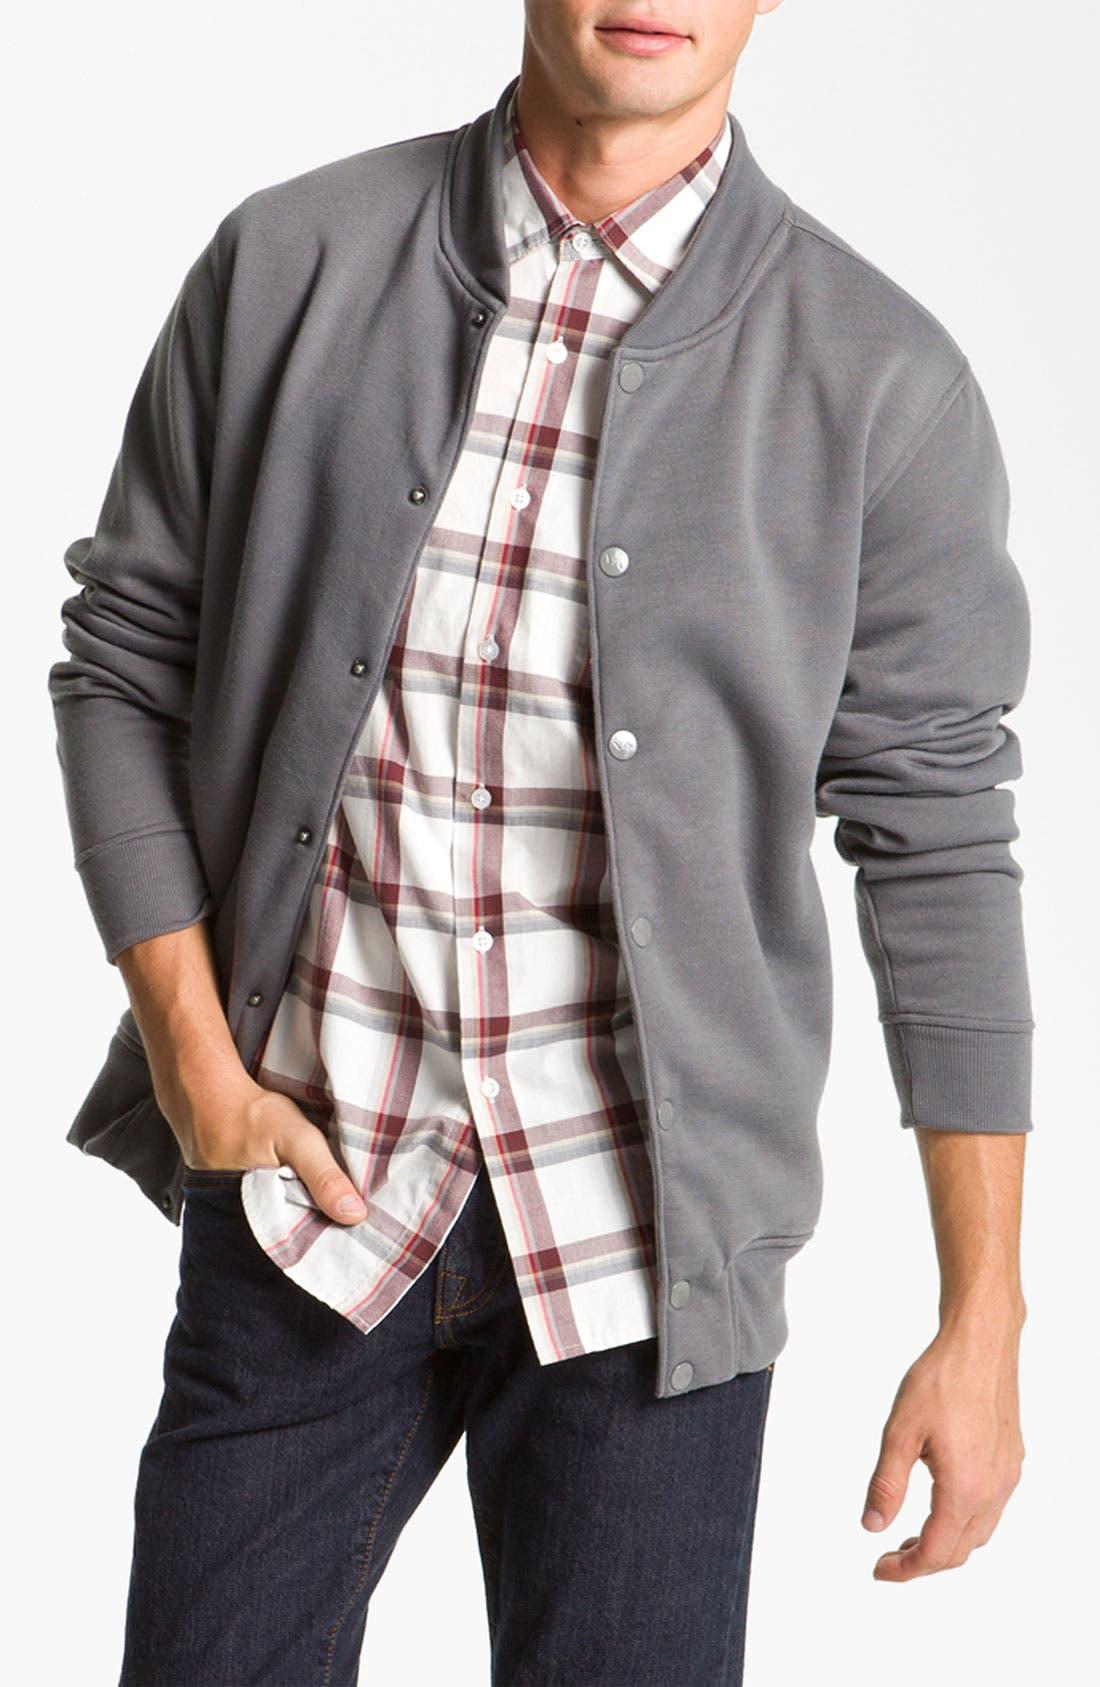 Main Image - RVCA 'Grabber' Jacket